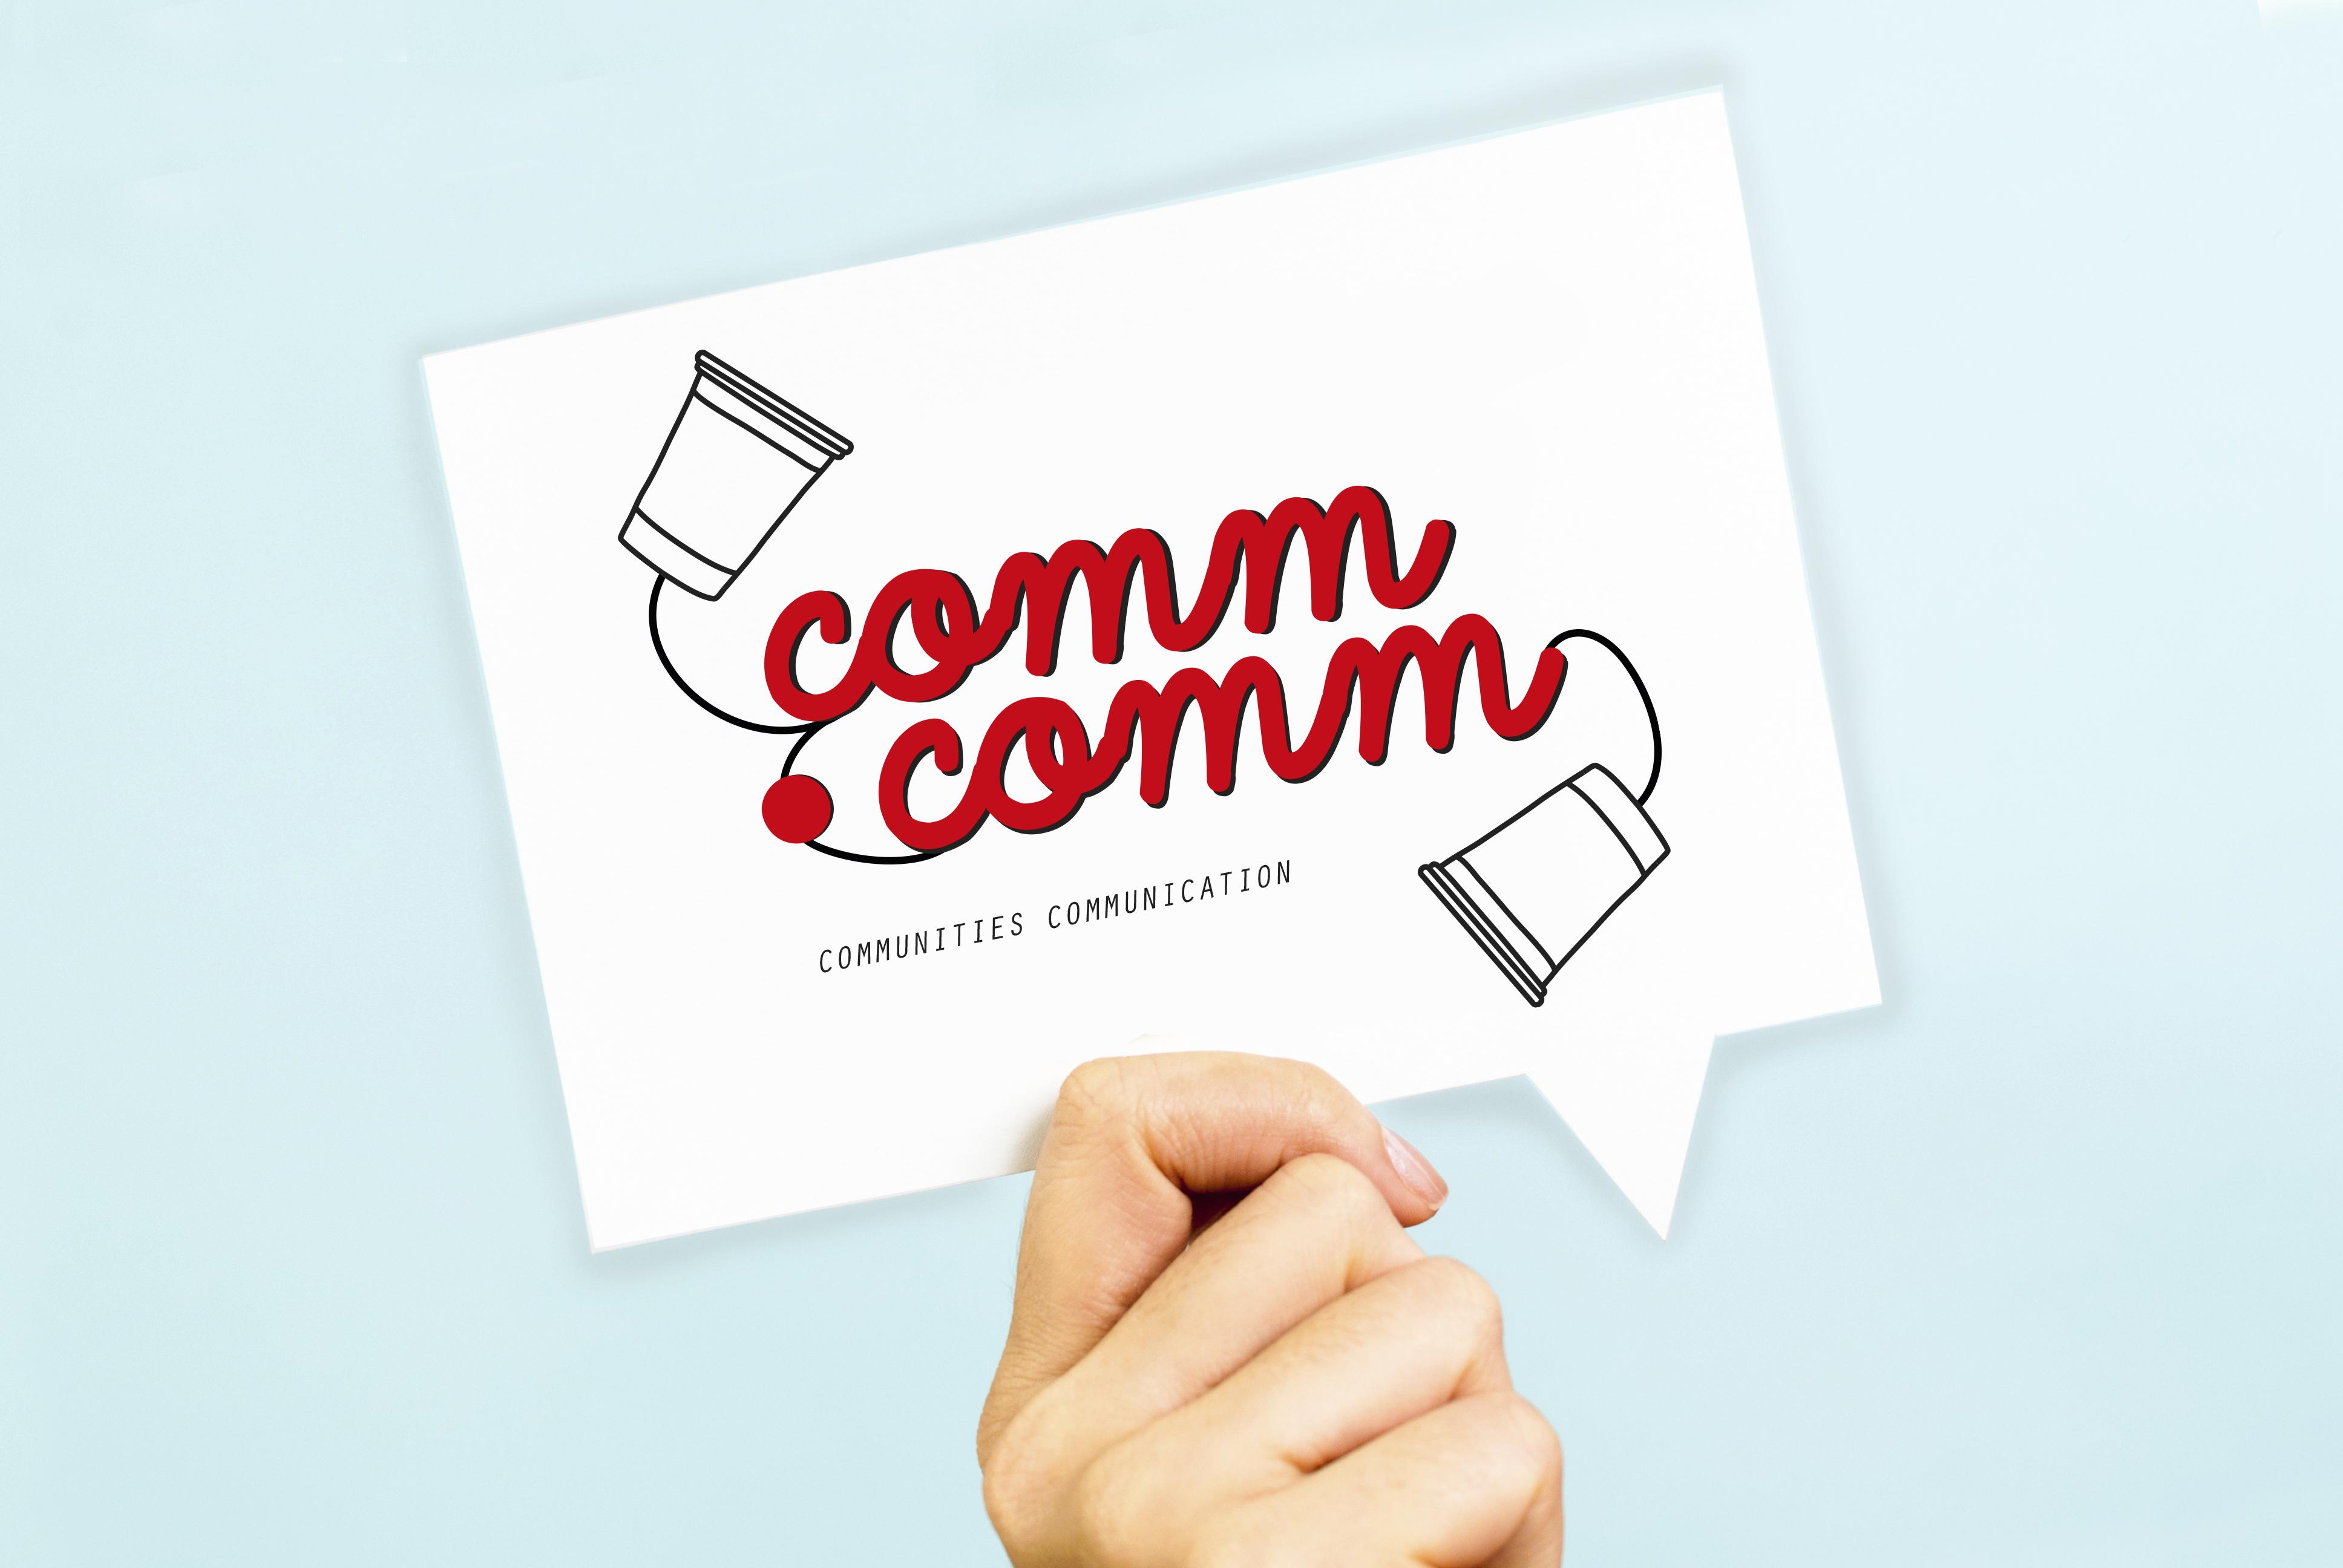 CommComm Team